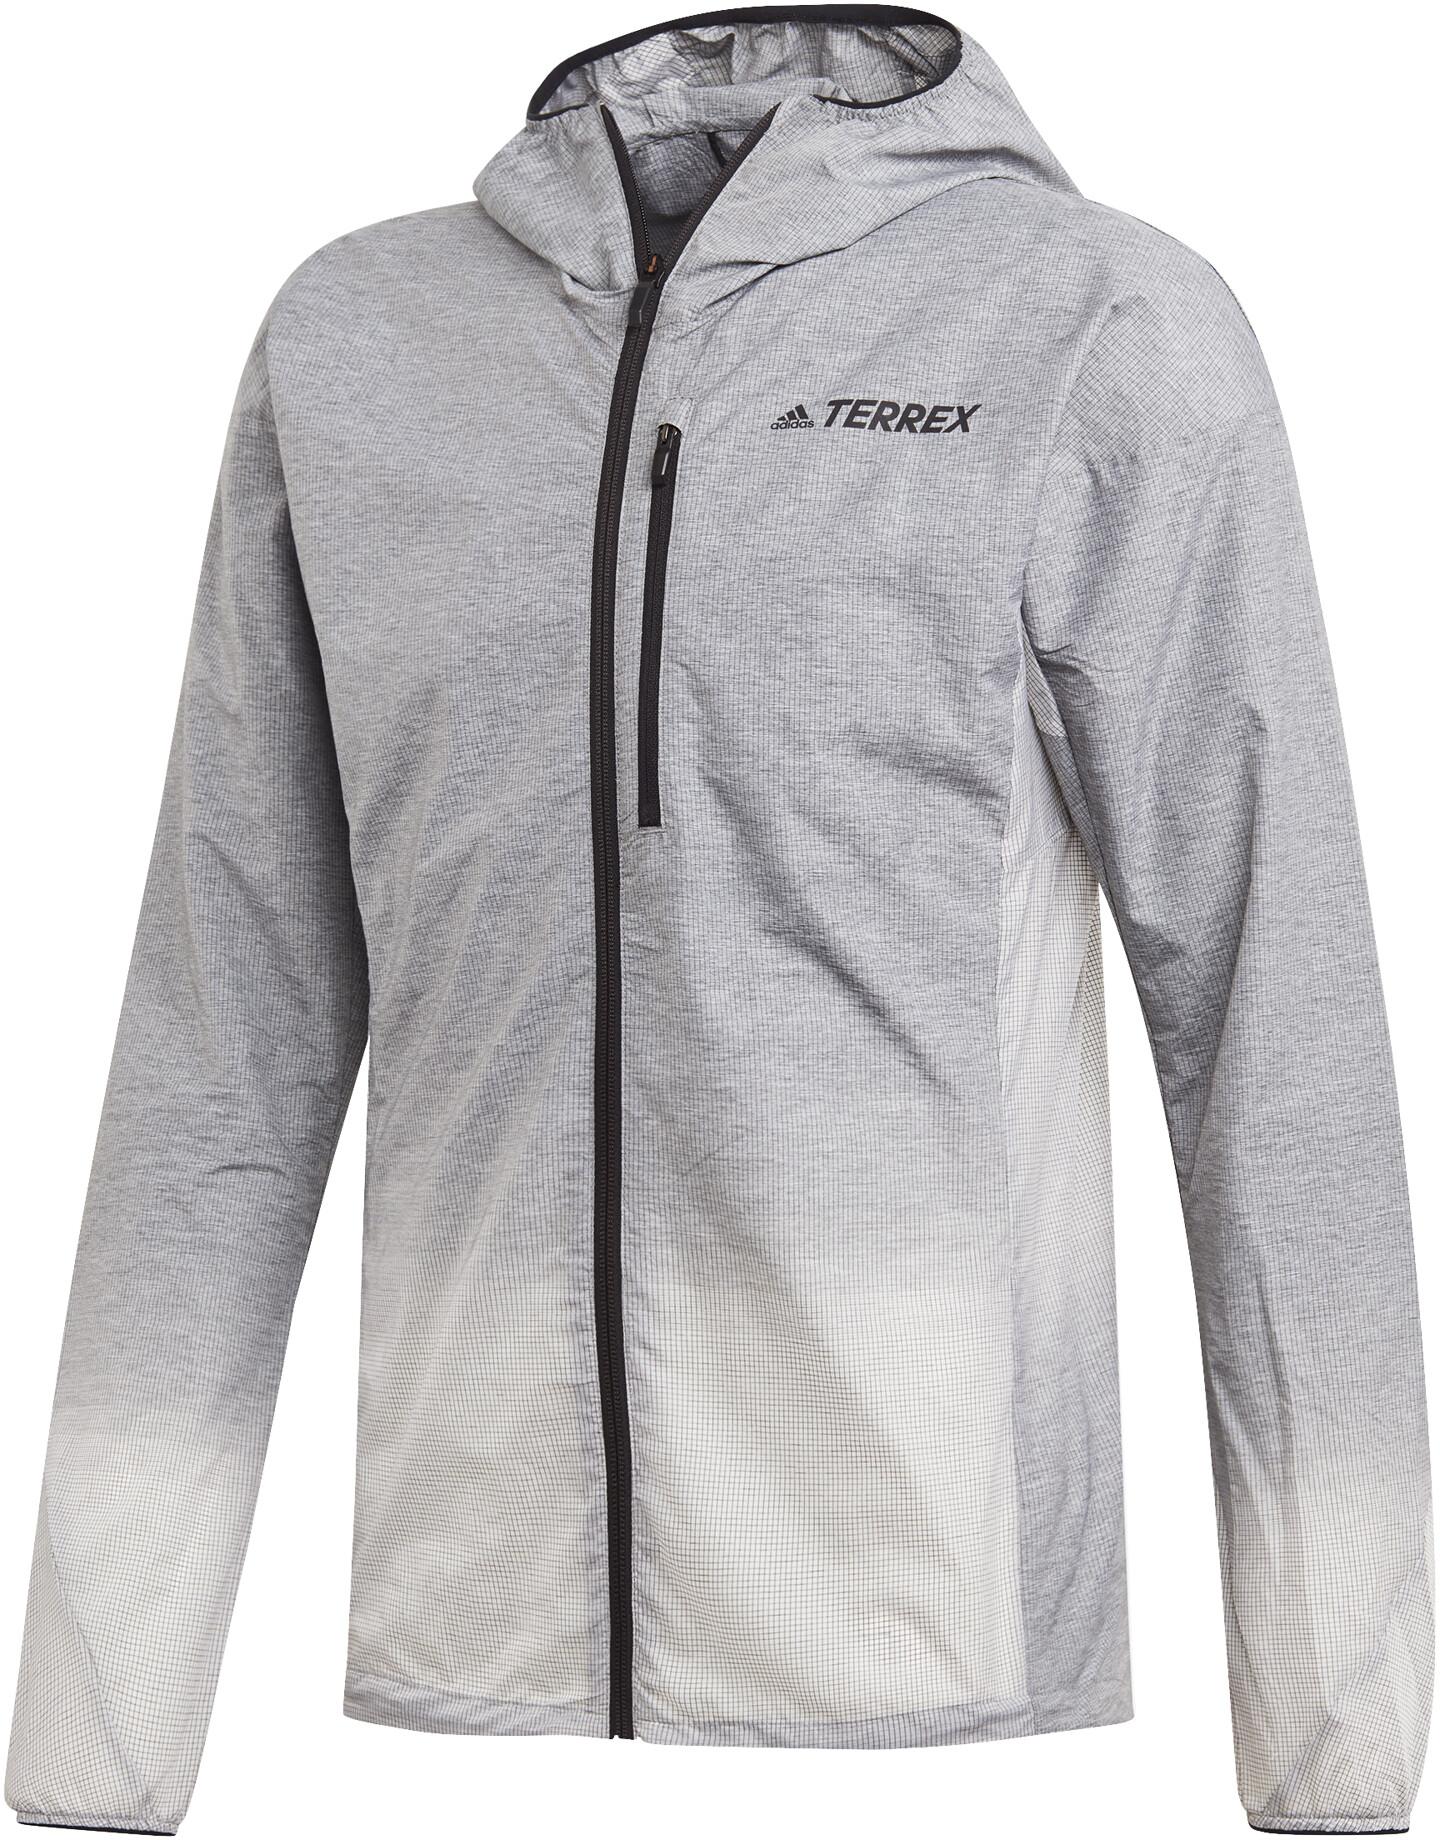 adidas TERREX Agravic Windweave Løbejakke Herrer, grey four/white (2019) | Jackets